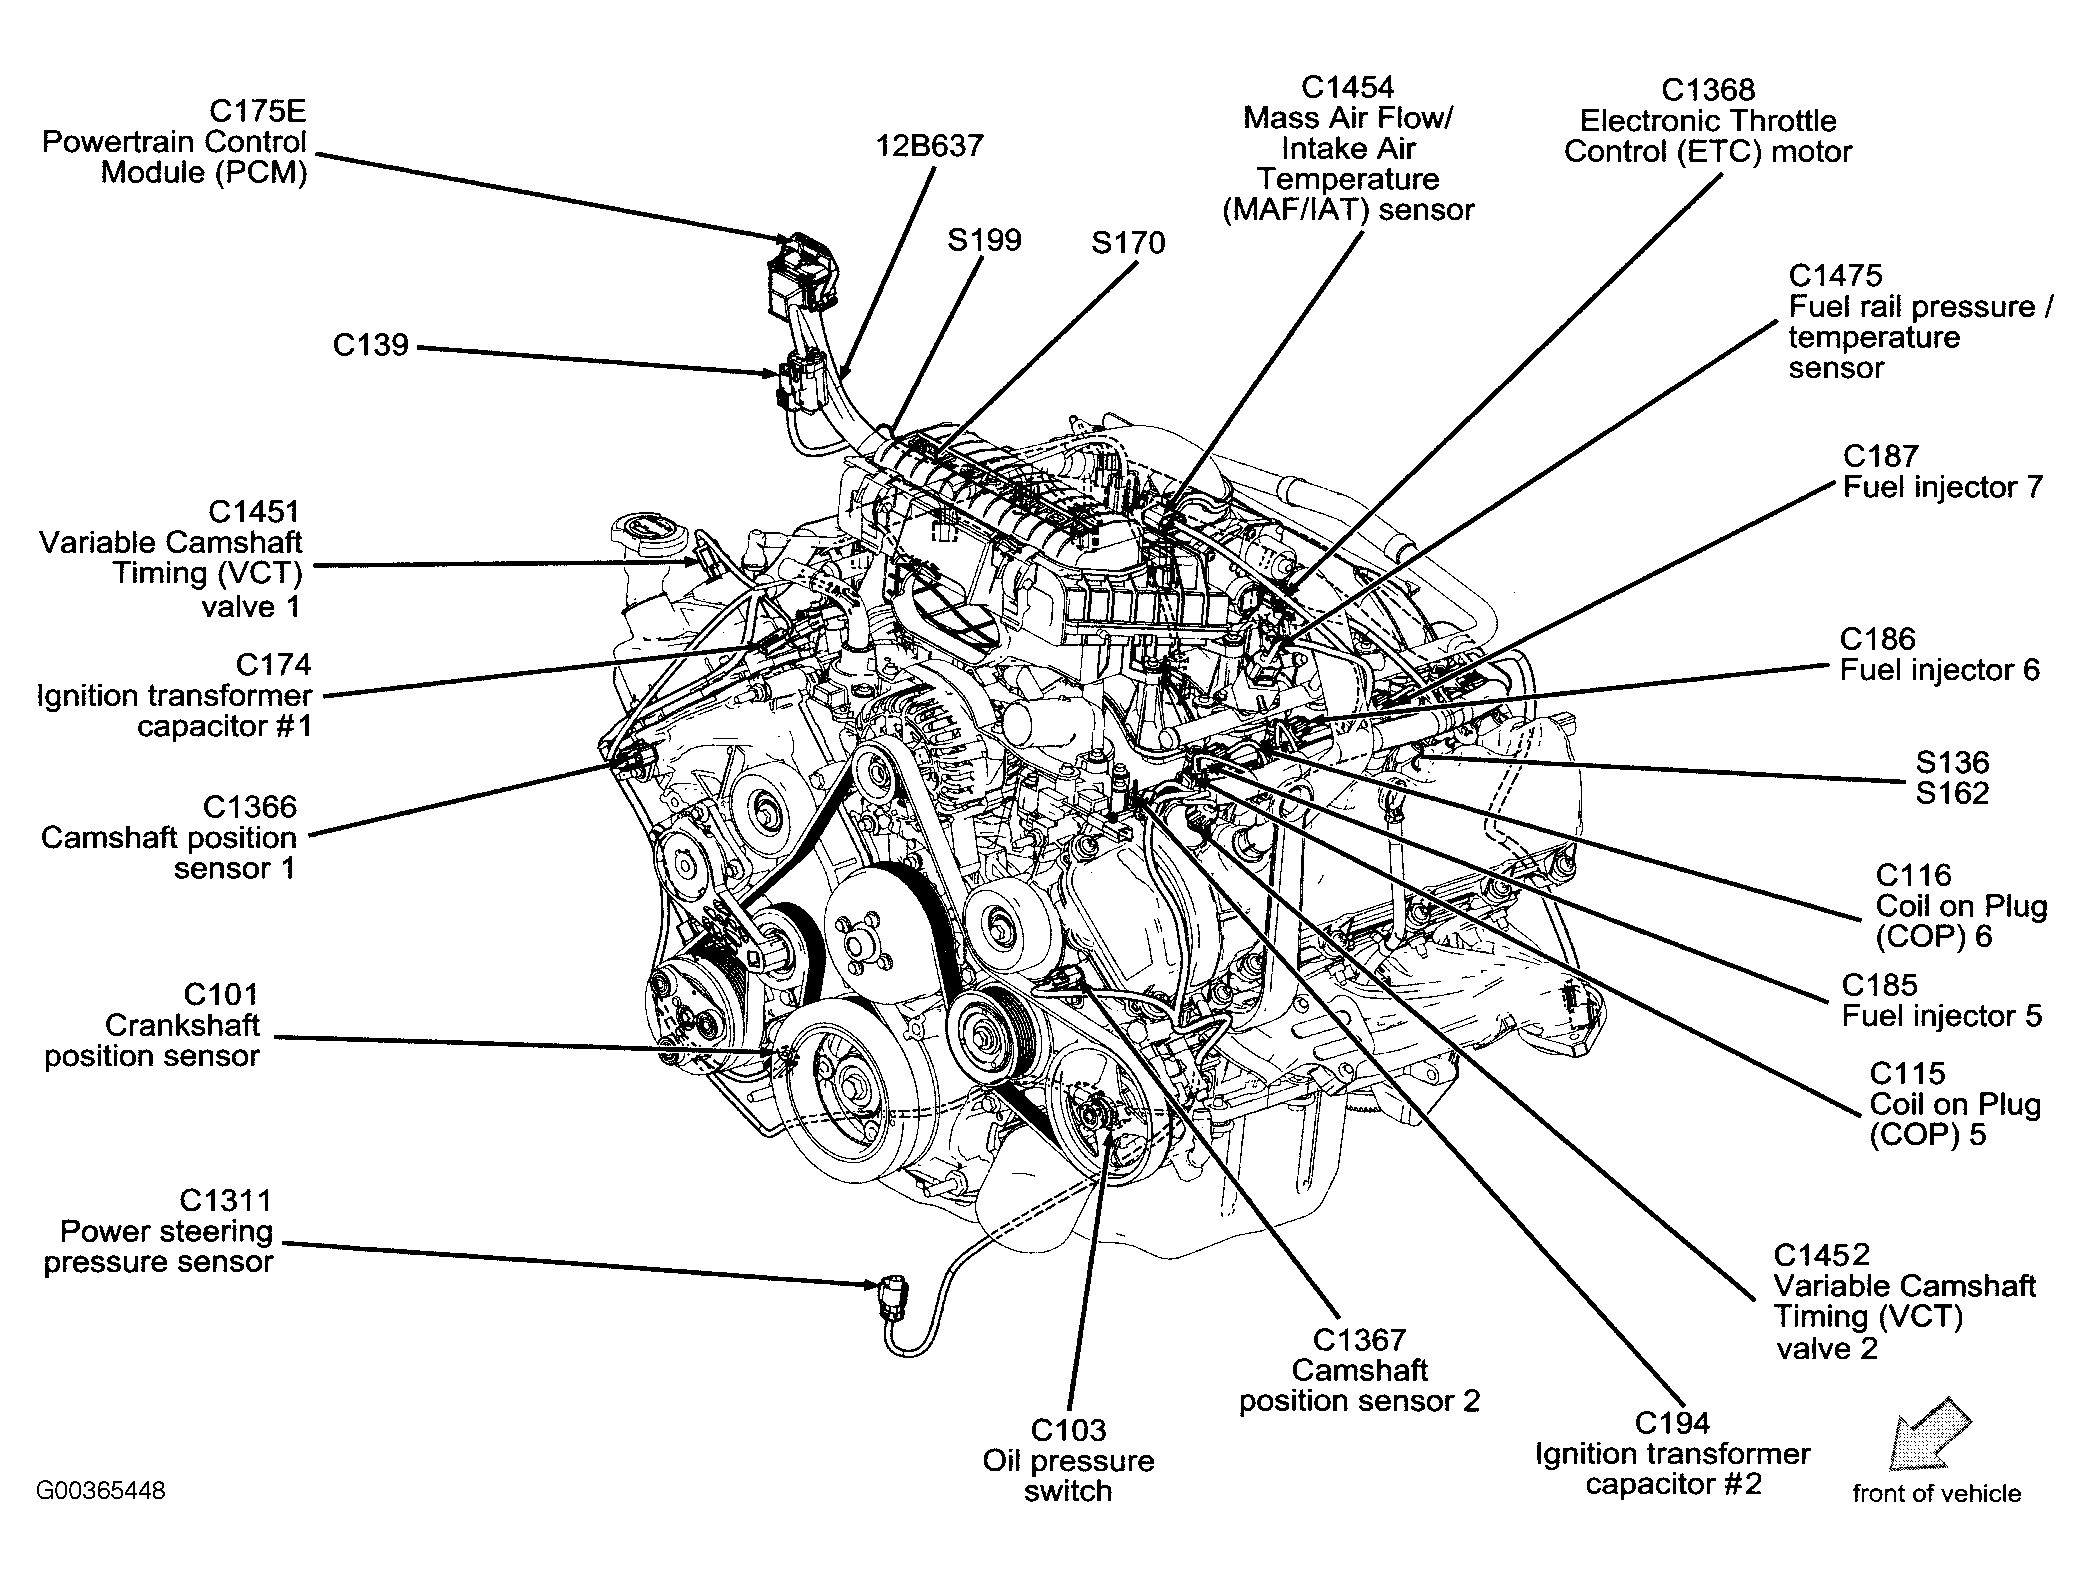 Vw V6 Engine Diagram - Wiring Diagram Directory Vr Engine Coolant Diagram on 1.8t coolant diagram, car coolant diagram, engine coolant diagram, buick v6 coolant diagram, t5 coolant diagram,